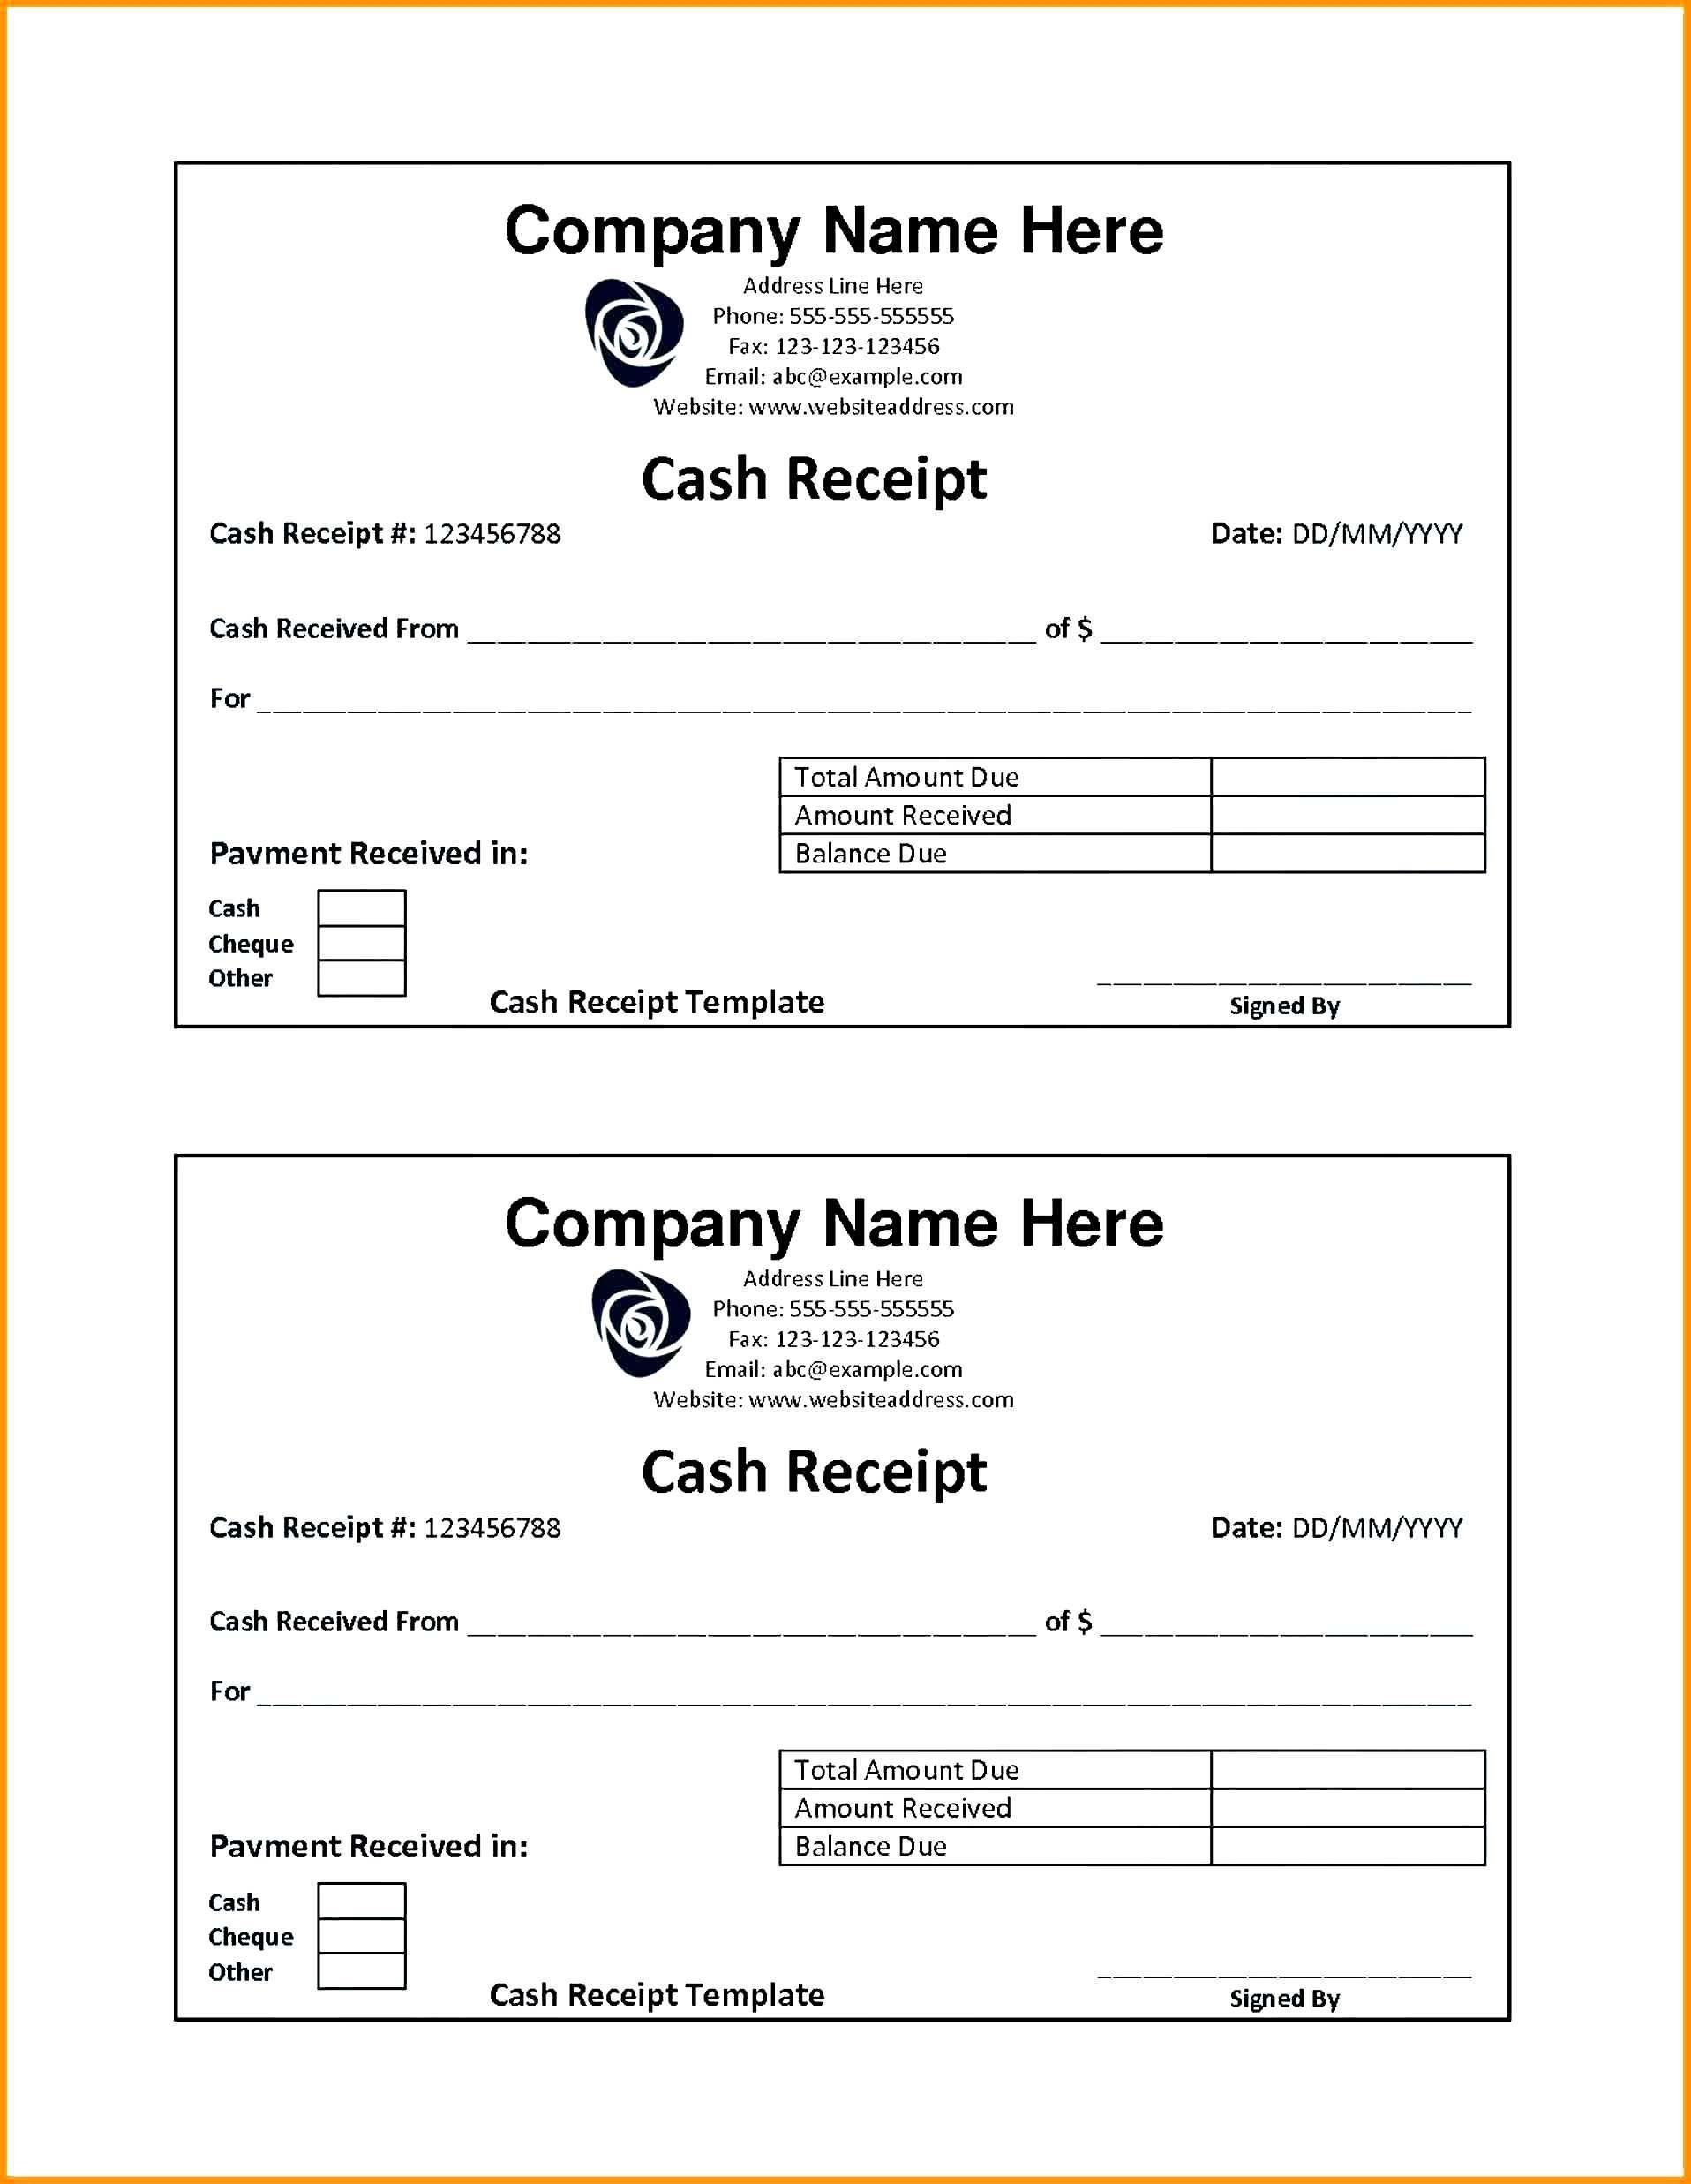 Sample Cash Receipt Templates Receipt Template Invoice Template Word Invoice Template